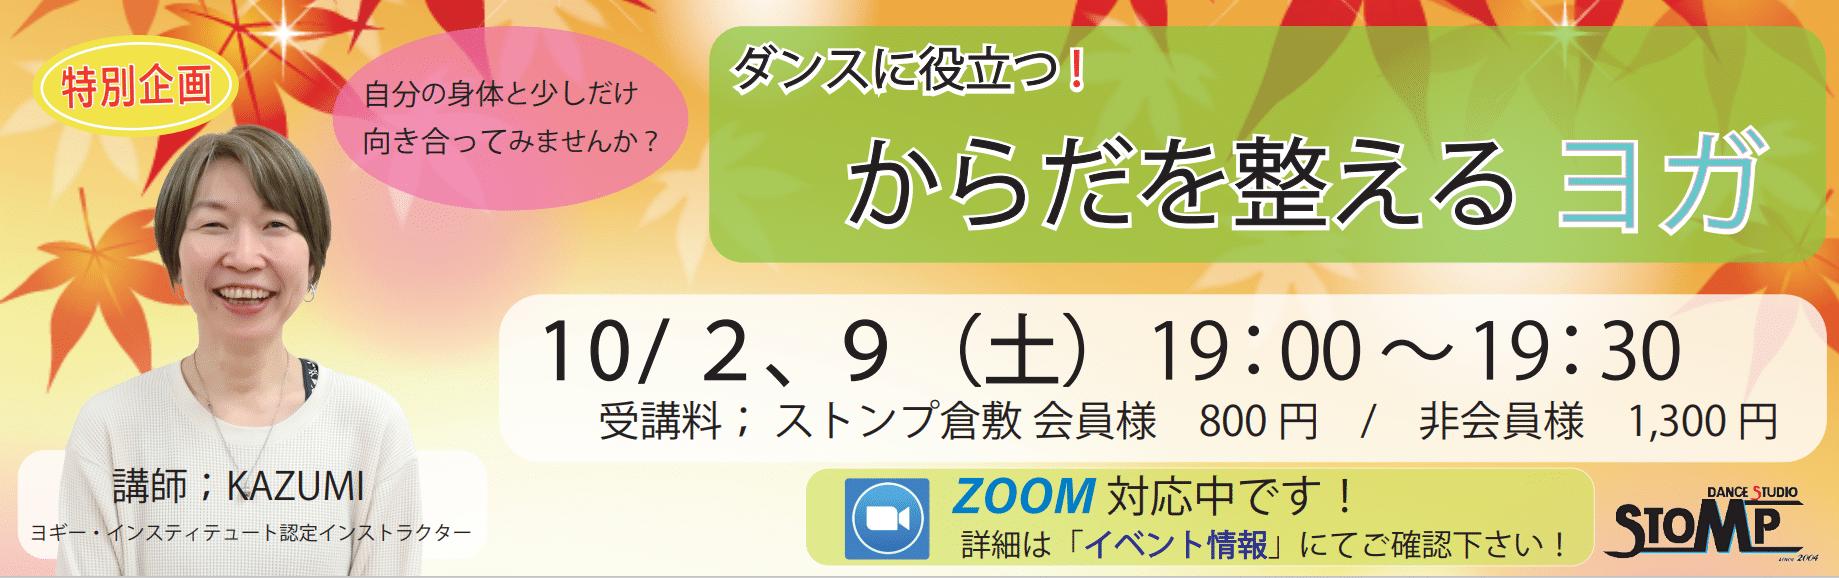 DANCE STUDIO STOMP 倉敷店2